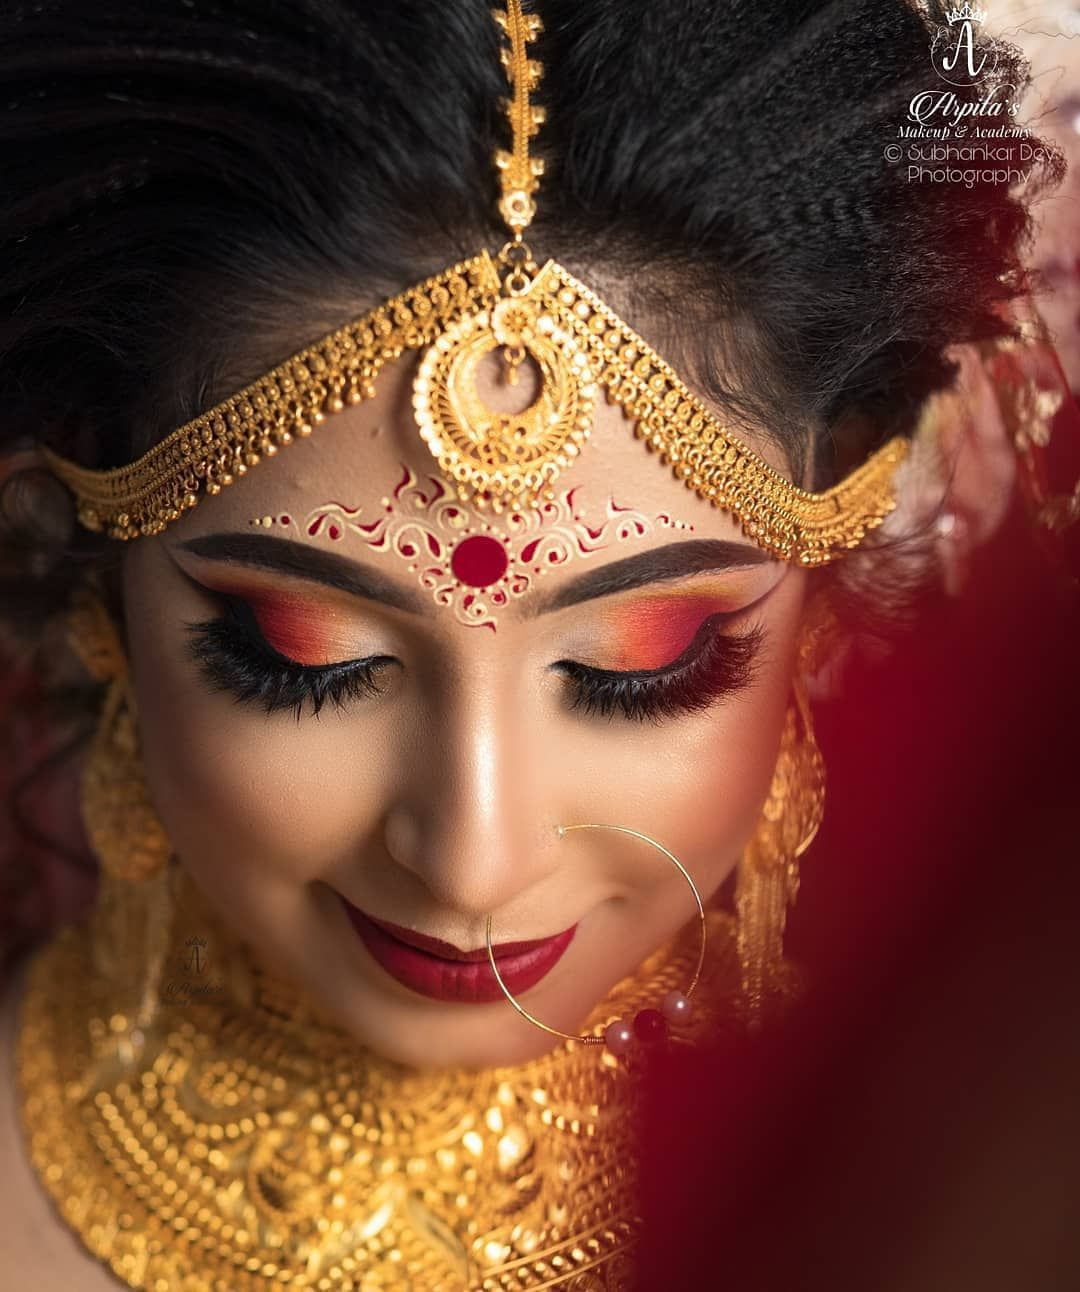 10 Bengali Bridal Kumkum Chandan Designs That Are Khuba Sundara Bridal Eye Makeup Bridal Makeup Images Bengali Bridal Makeup